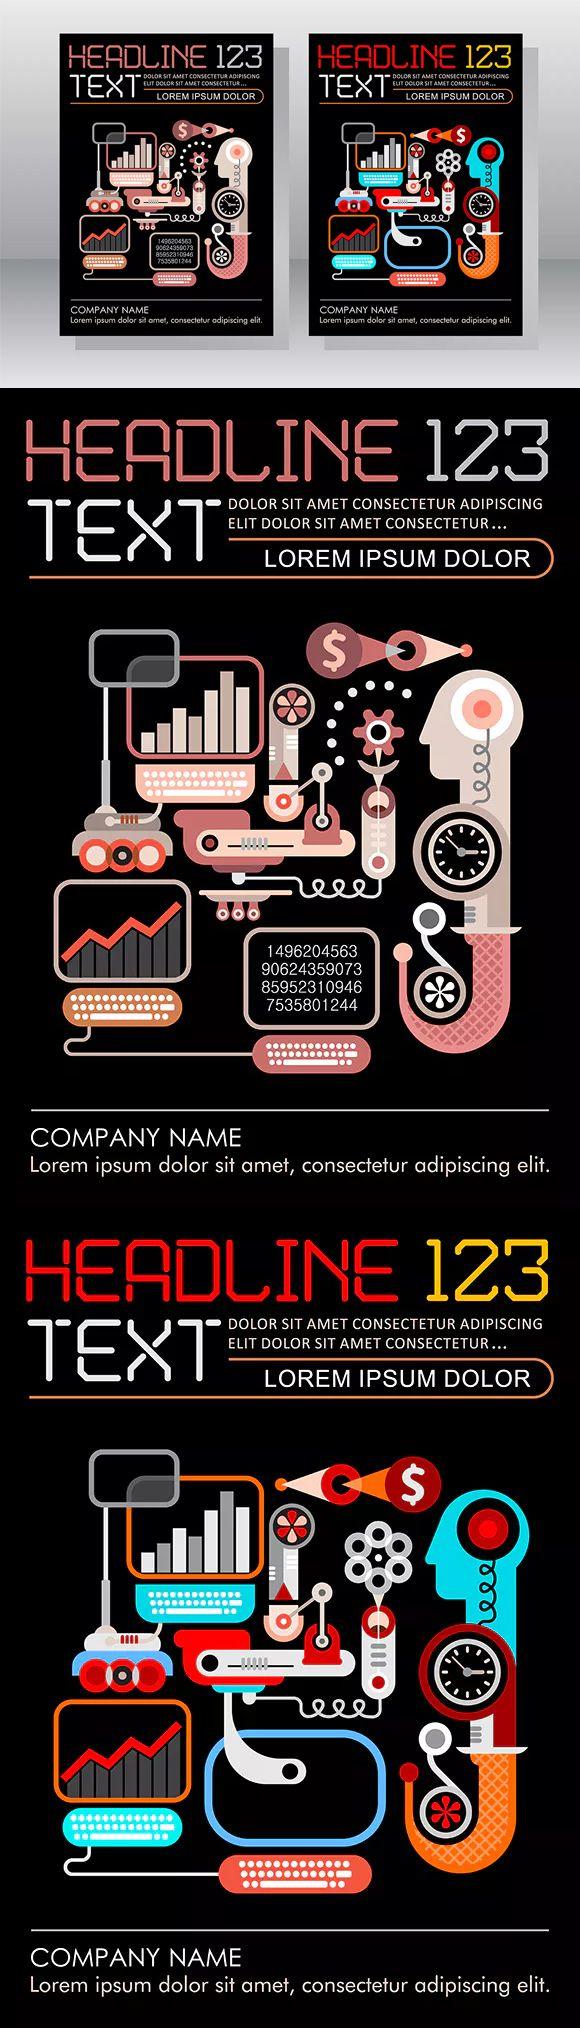 E-commerce Business Leaflet Template Design AI, EPS